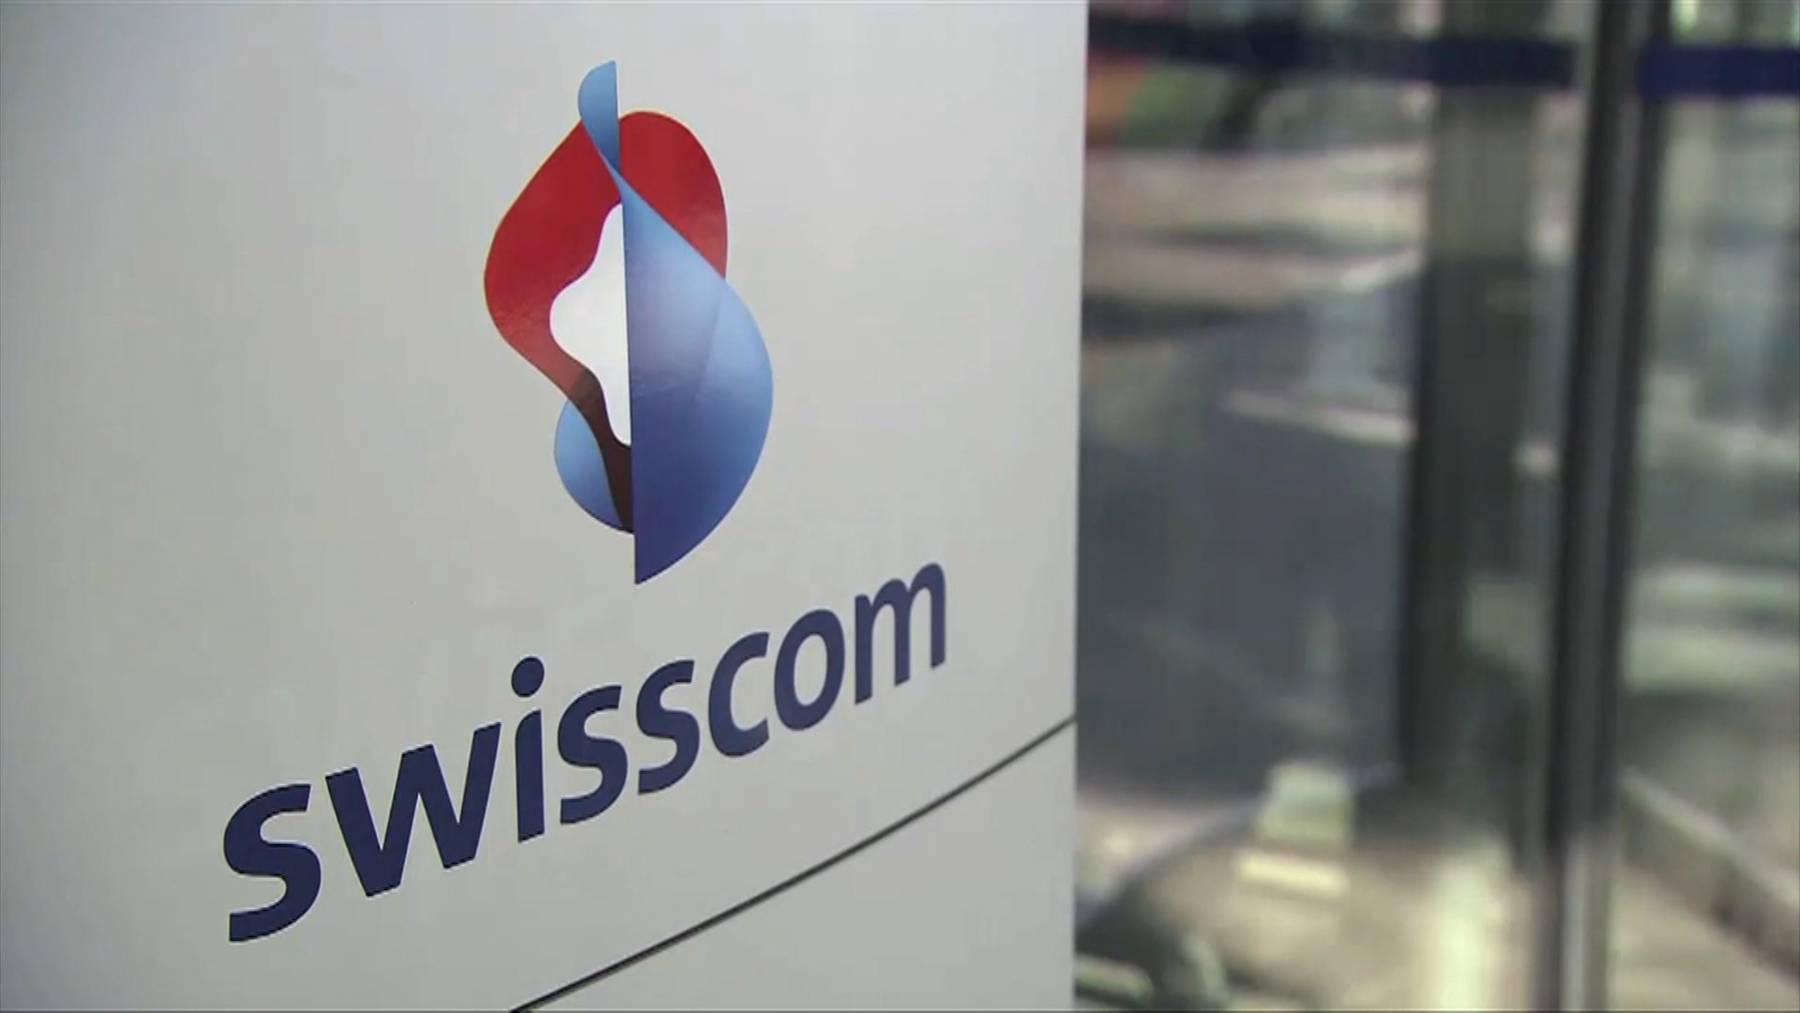 Thumb for ‹Swisscom-Panne legte Notrufe in weiten Teilen der Schweiz lahm›